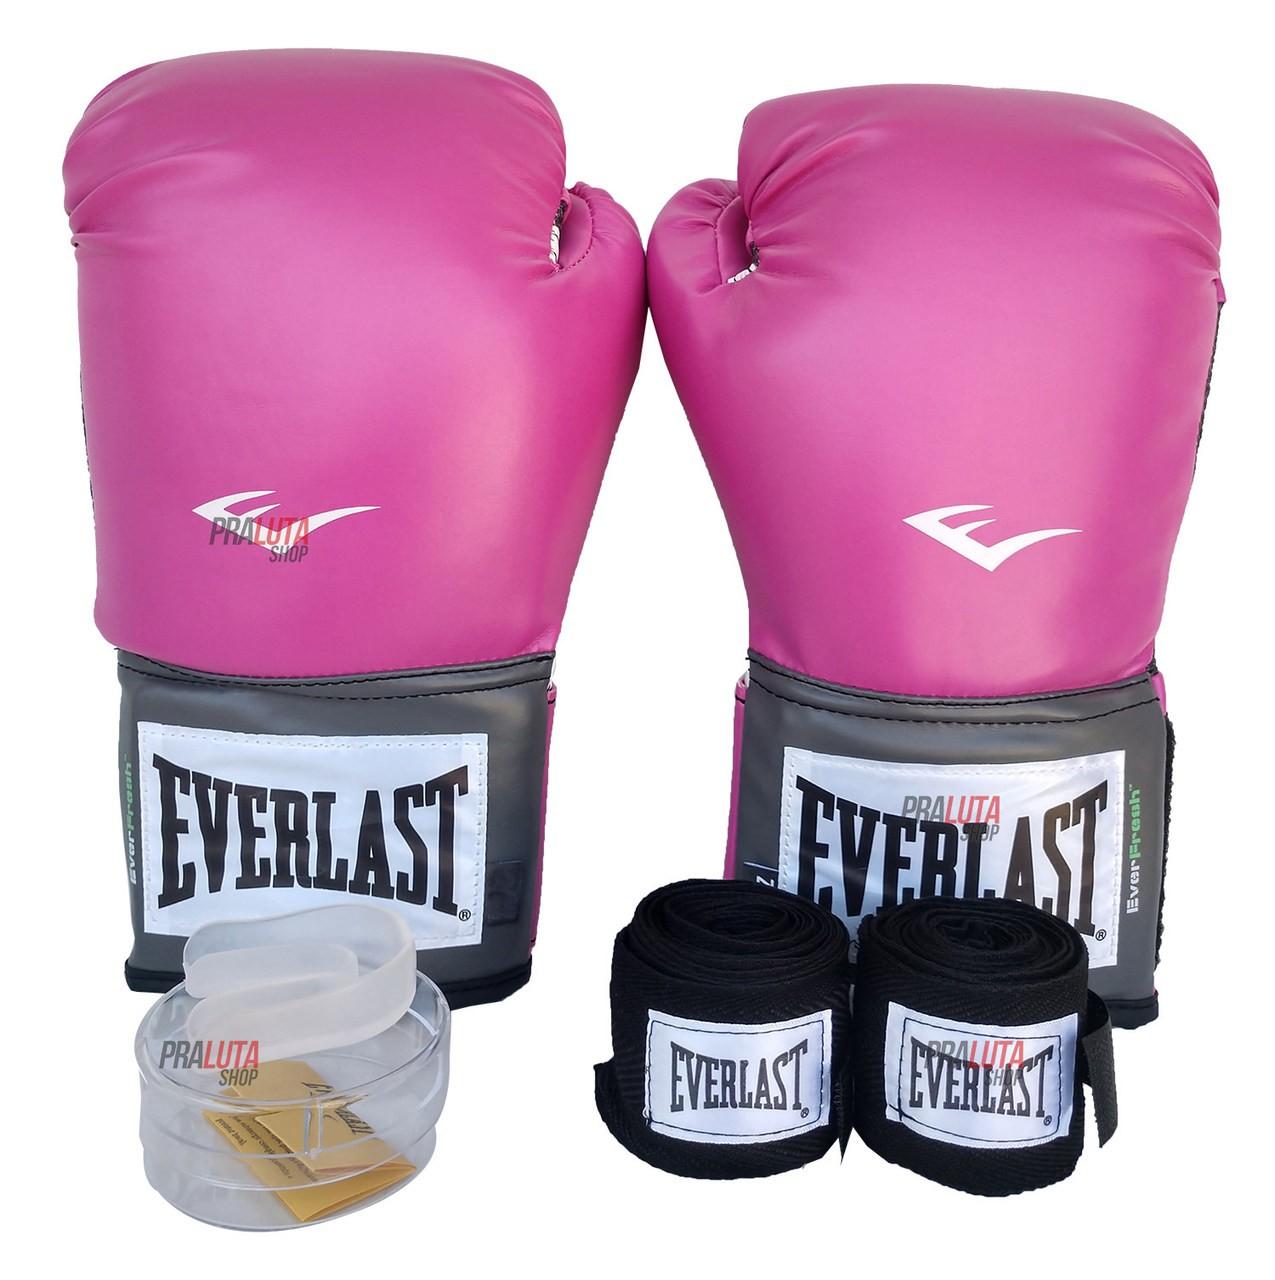 Kit de Boxe / Muay Thai Feminino 10oz - Rosa - Training - Everlast  - PRALUTA SHOP